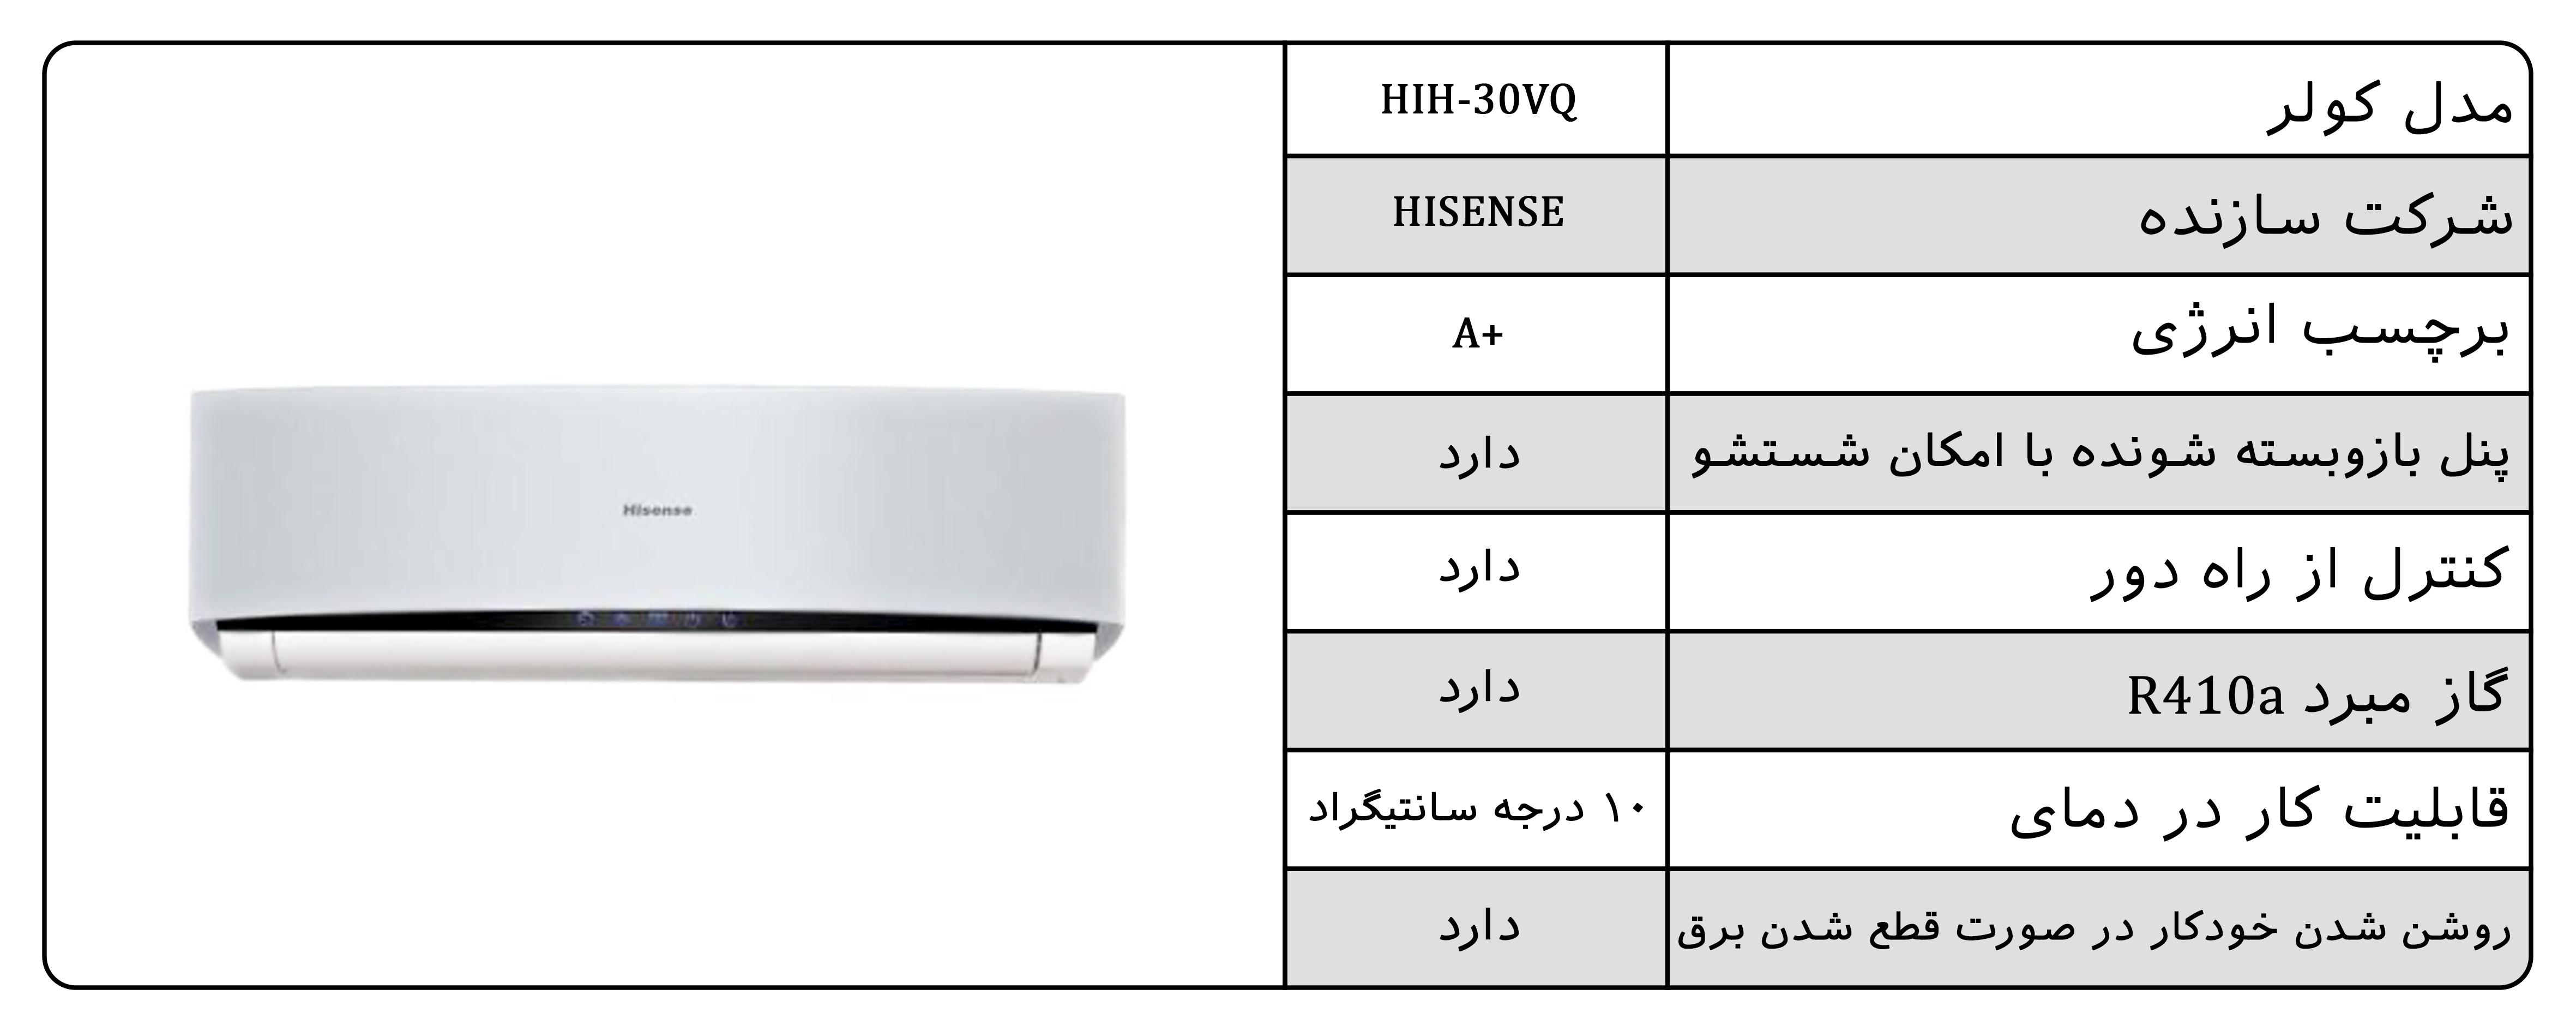 کولر گازی هایسنس hih-30vq